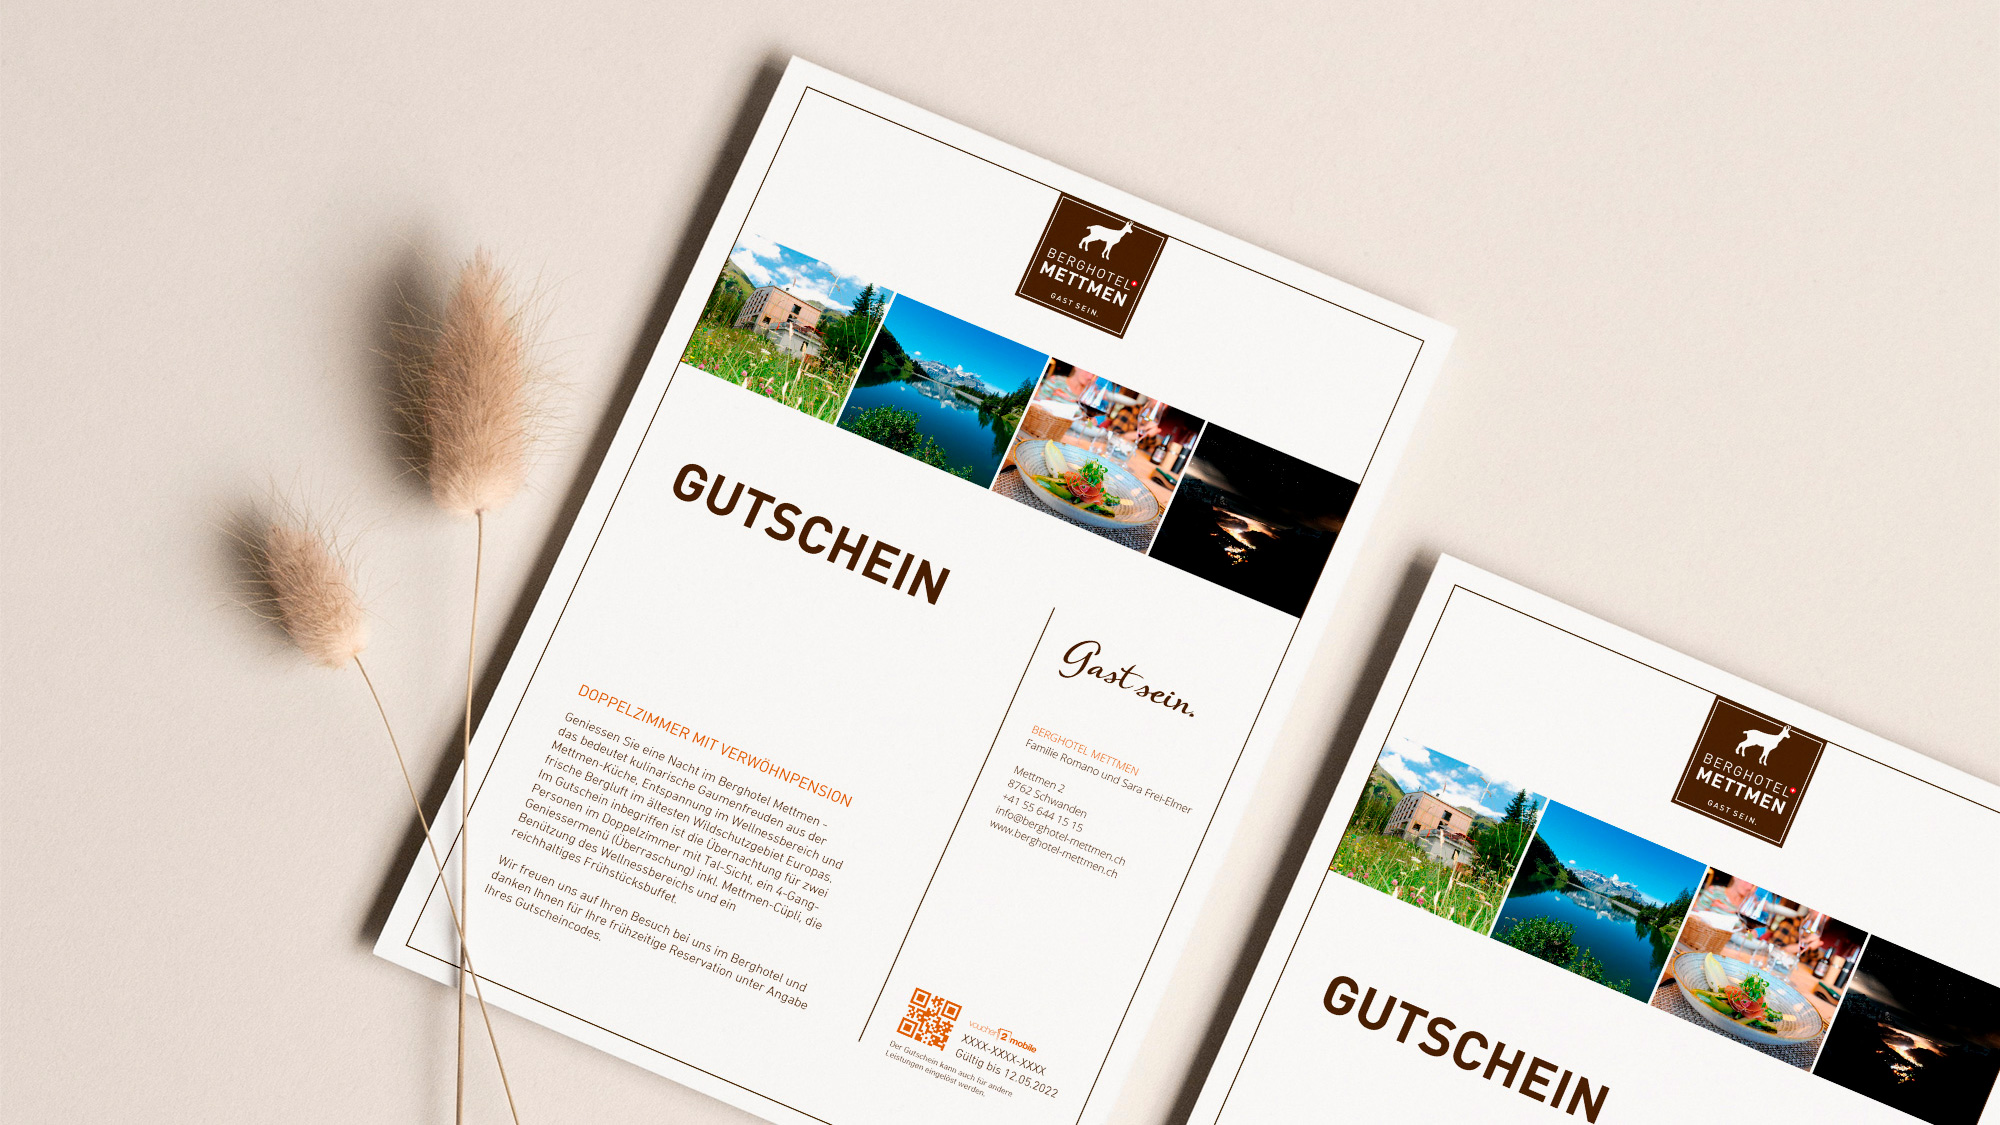 e-guma Gutscheinsystem Gutscheinlayout print@home Berghotel Mettmen